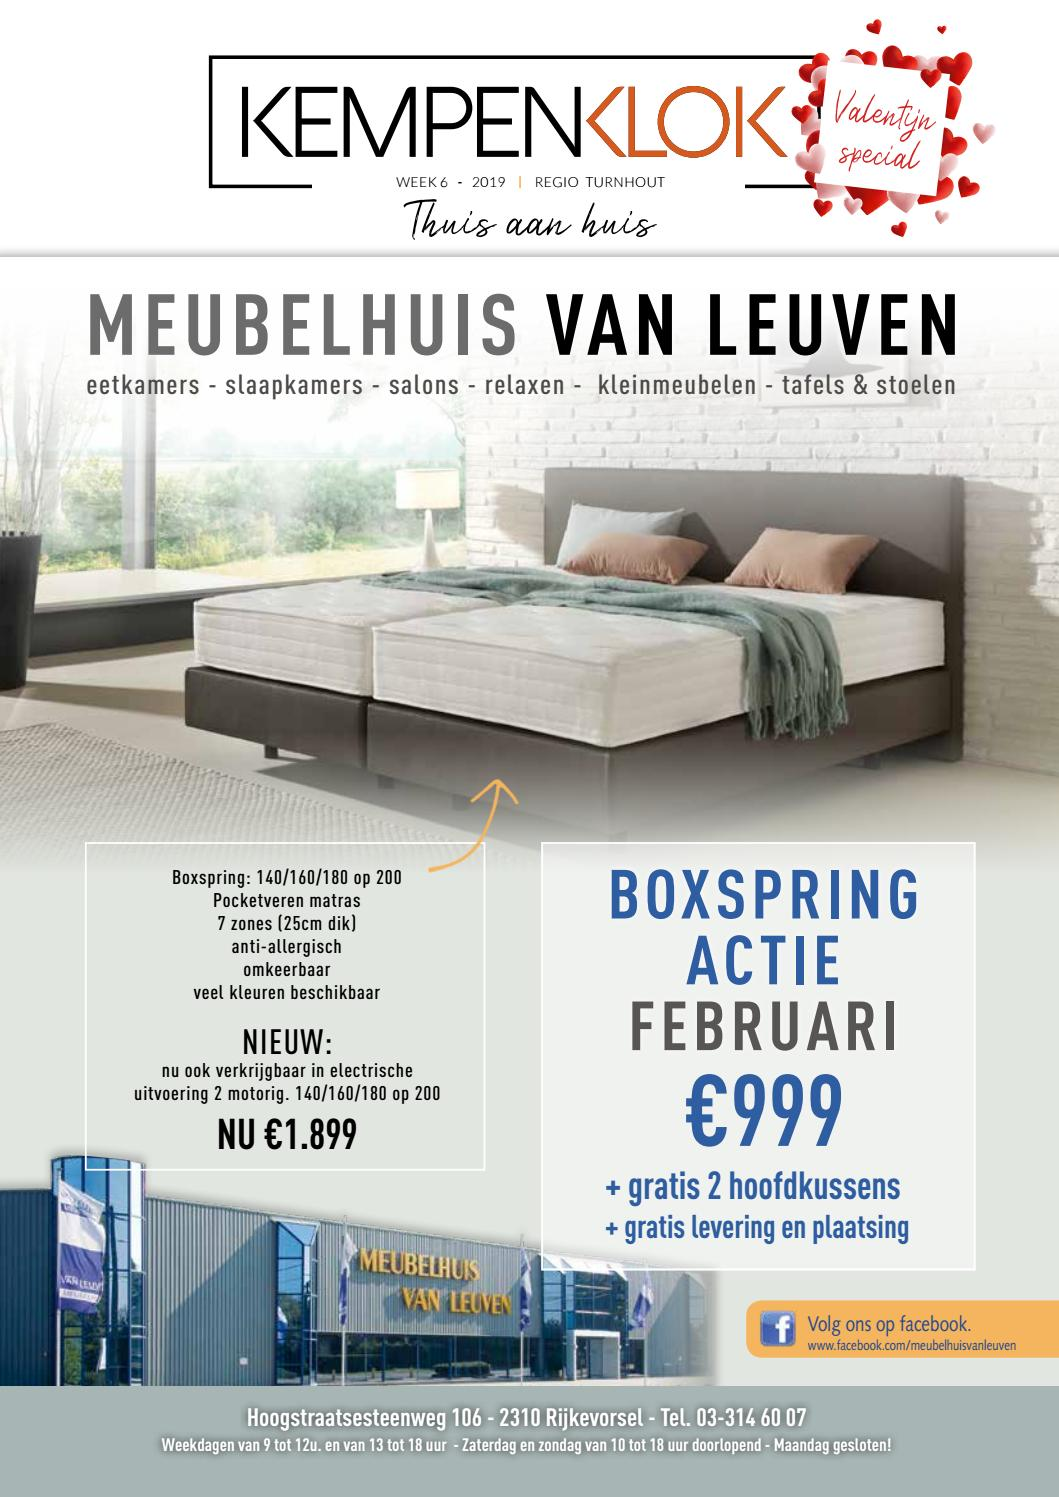 Kempenklok Turnhout Week 6 By Intermedia Contentmakers Issuu